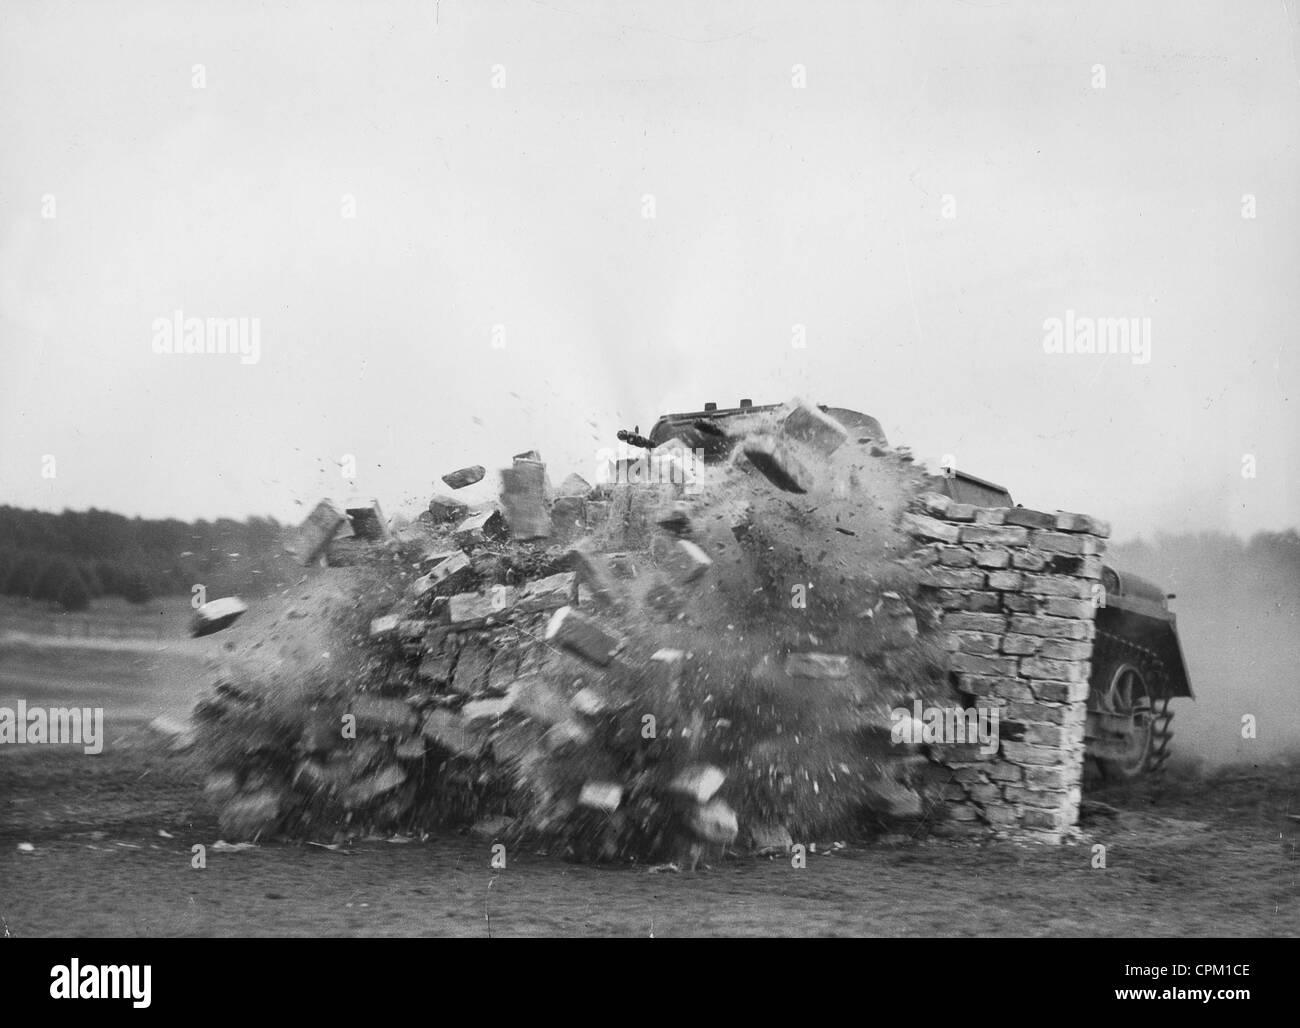 Panzer I breaks through a brick wall, 1936 - Stock Image